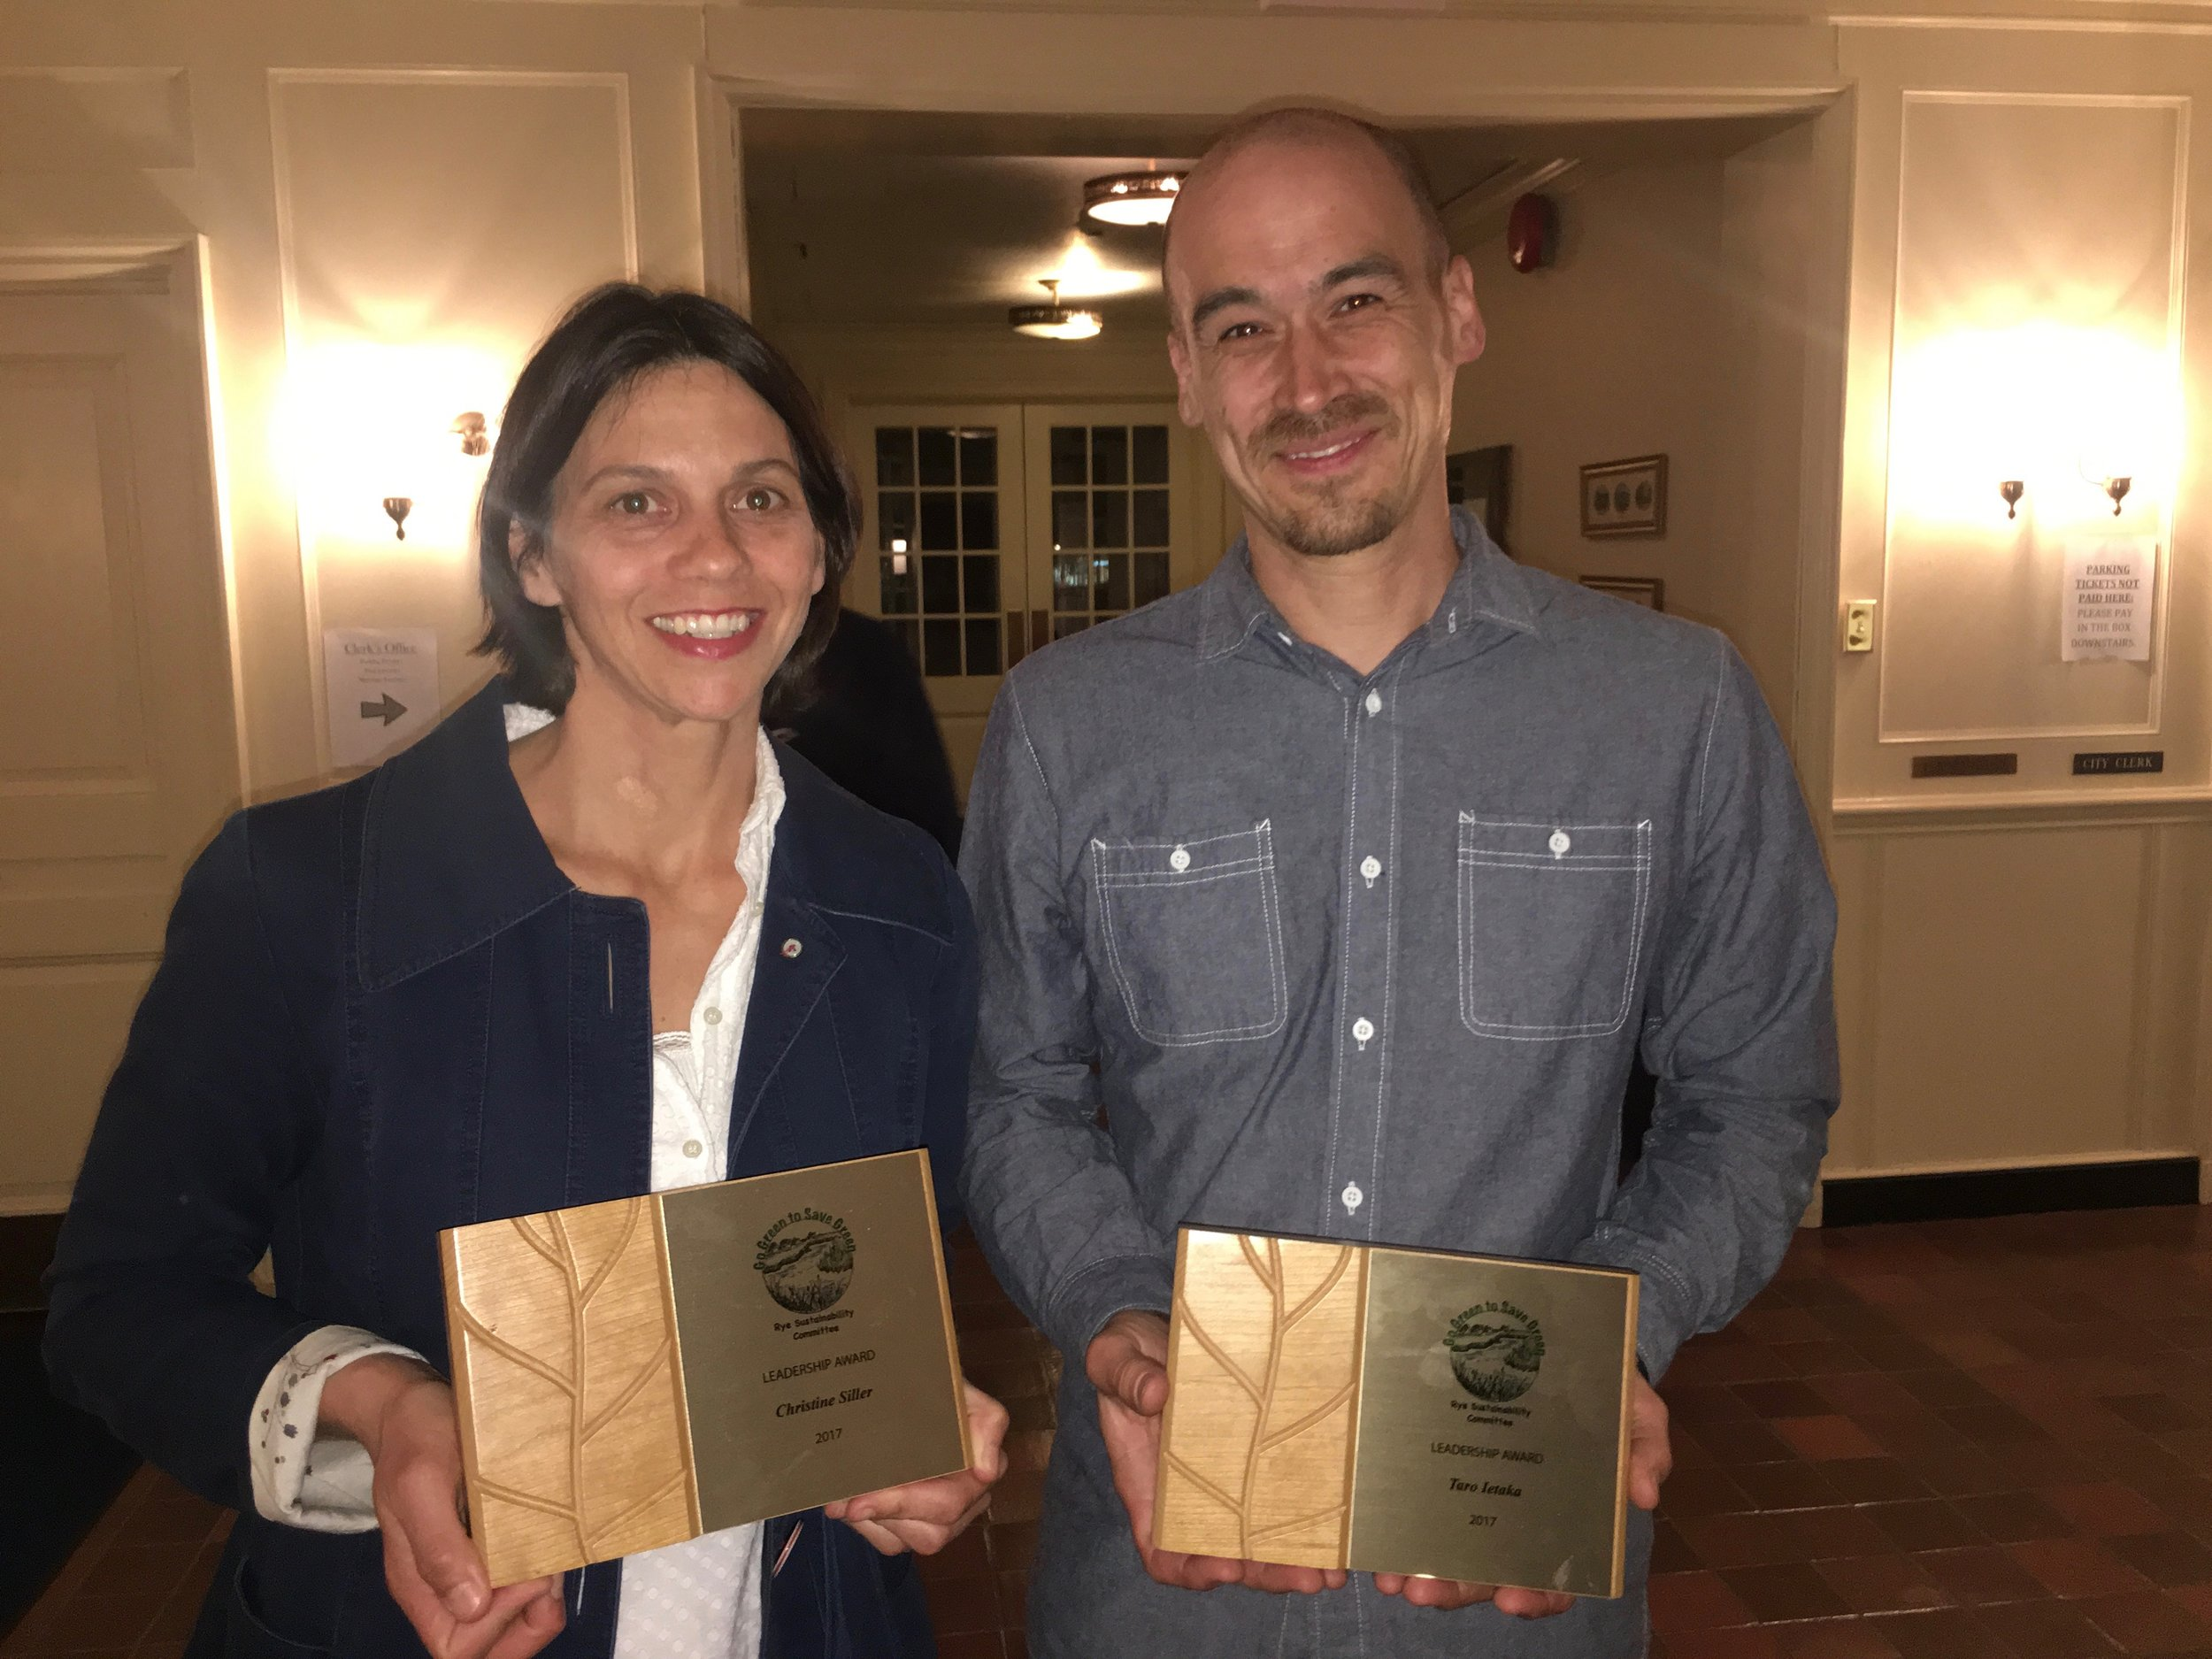 2017 Rye Sustainability Leadership Award winners Christine Siller and Taro Ietaka